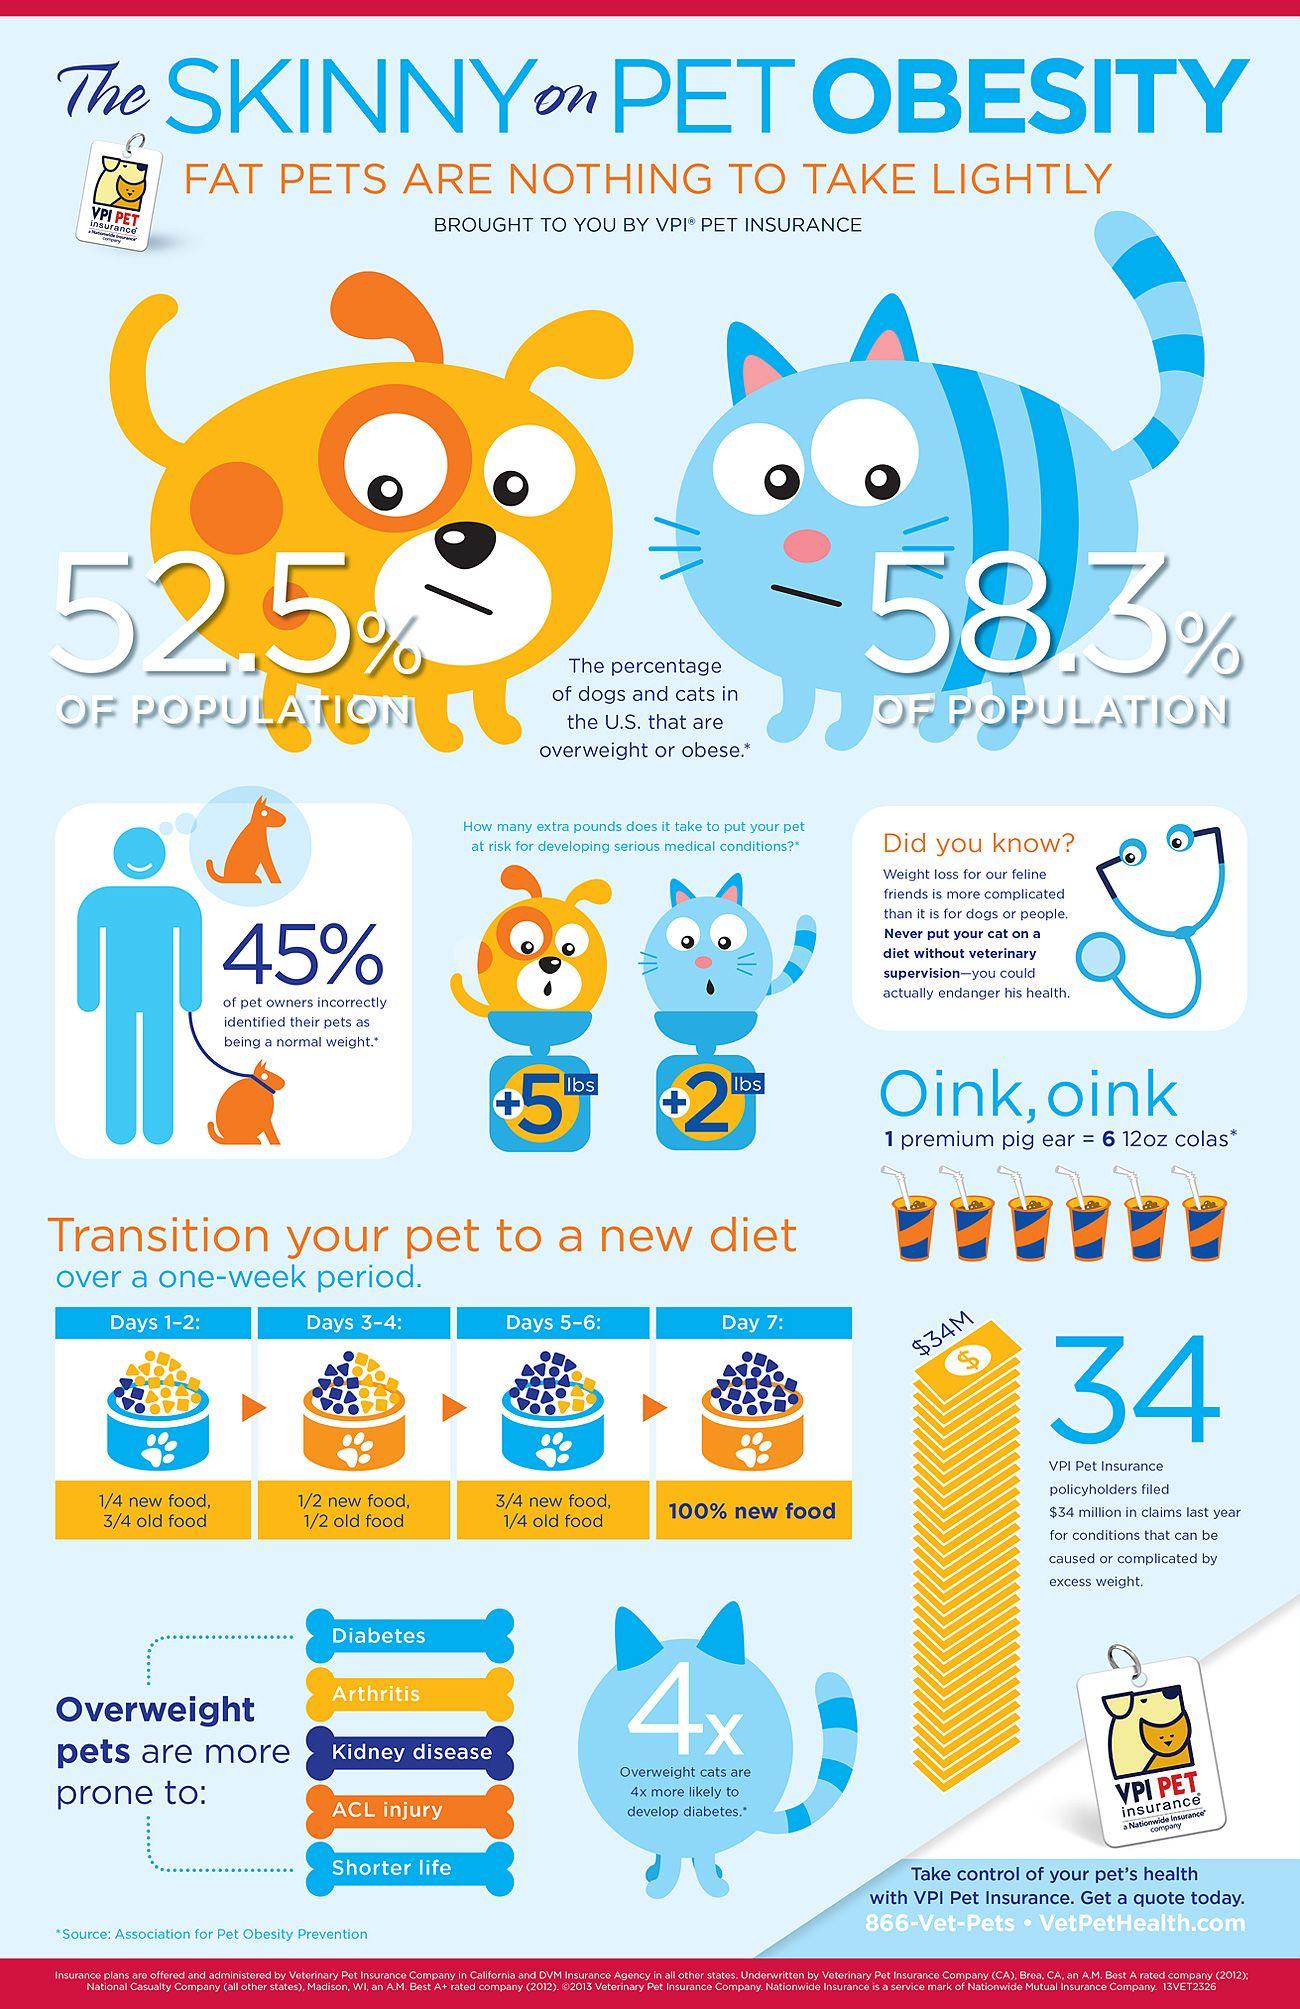 Veterinary Pet Insurance Pet Health Insurance Plans For Your Dog Or Cat Pet Clinic Pet Health Pet Health Insurance